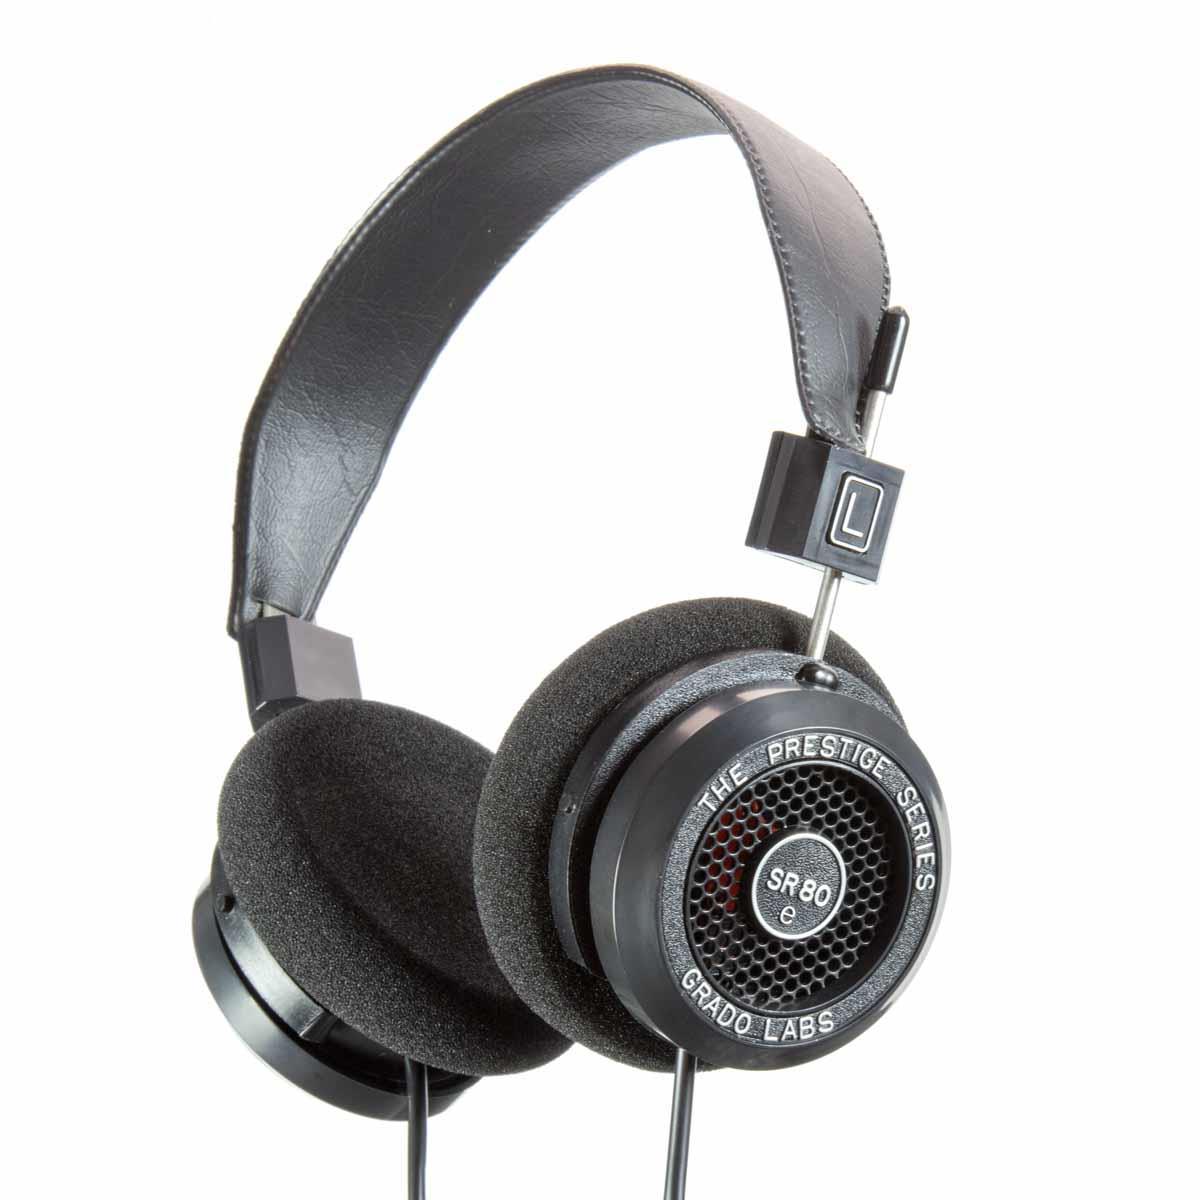 Grado SR80e + free Grado case + free delivery £95 @SevenOaks Sound & Vision